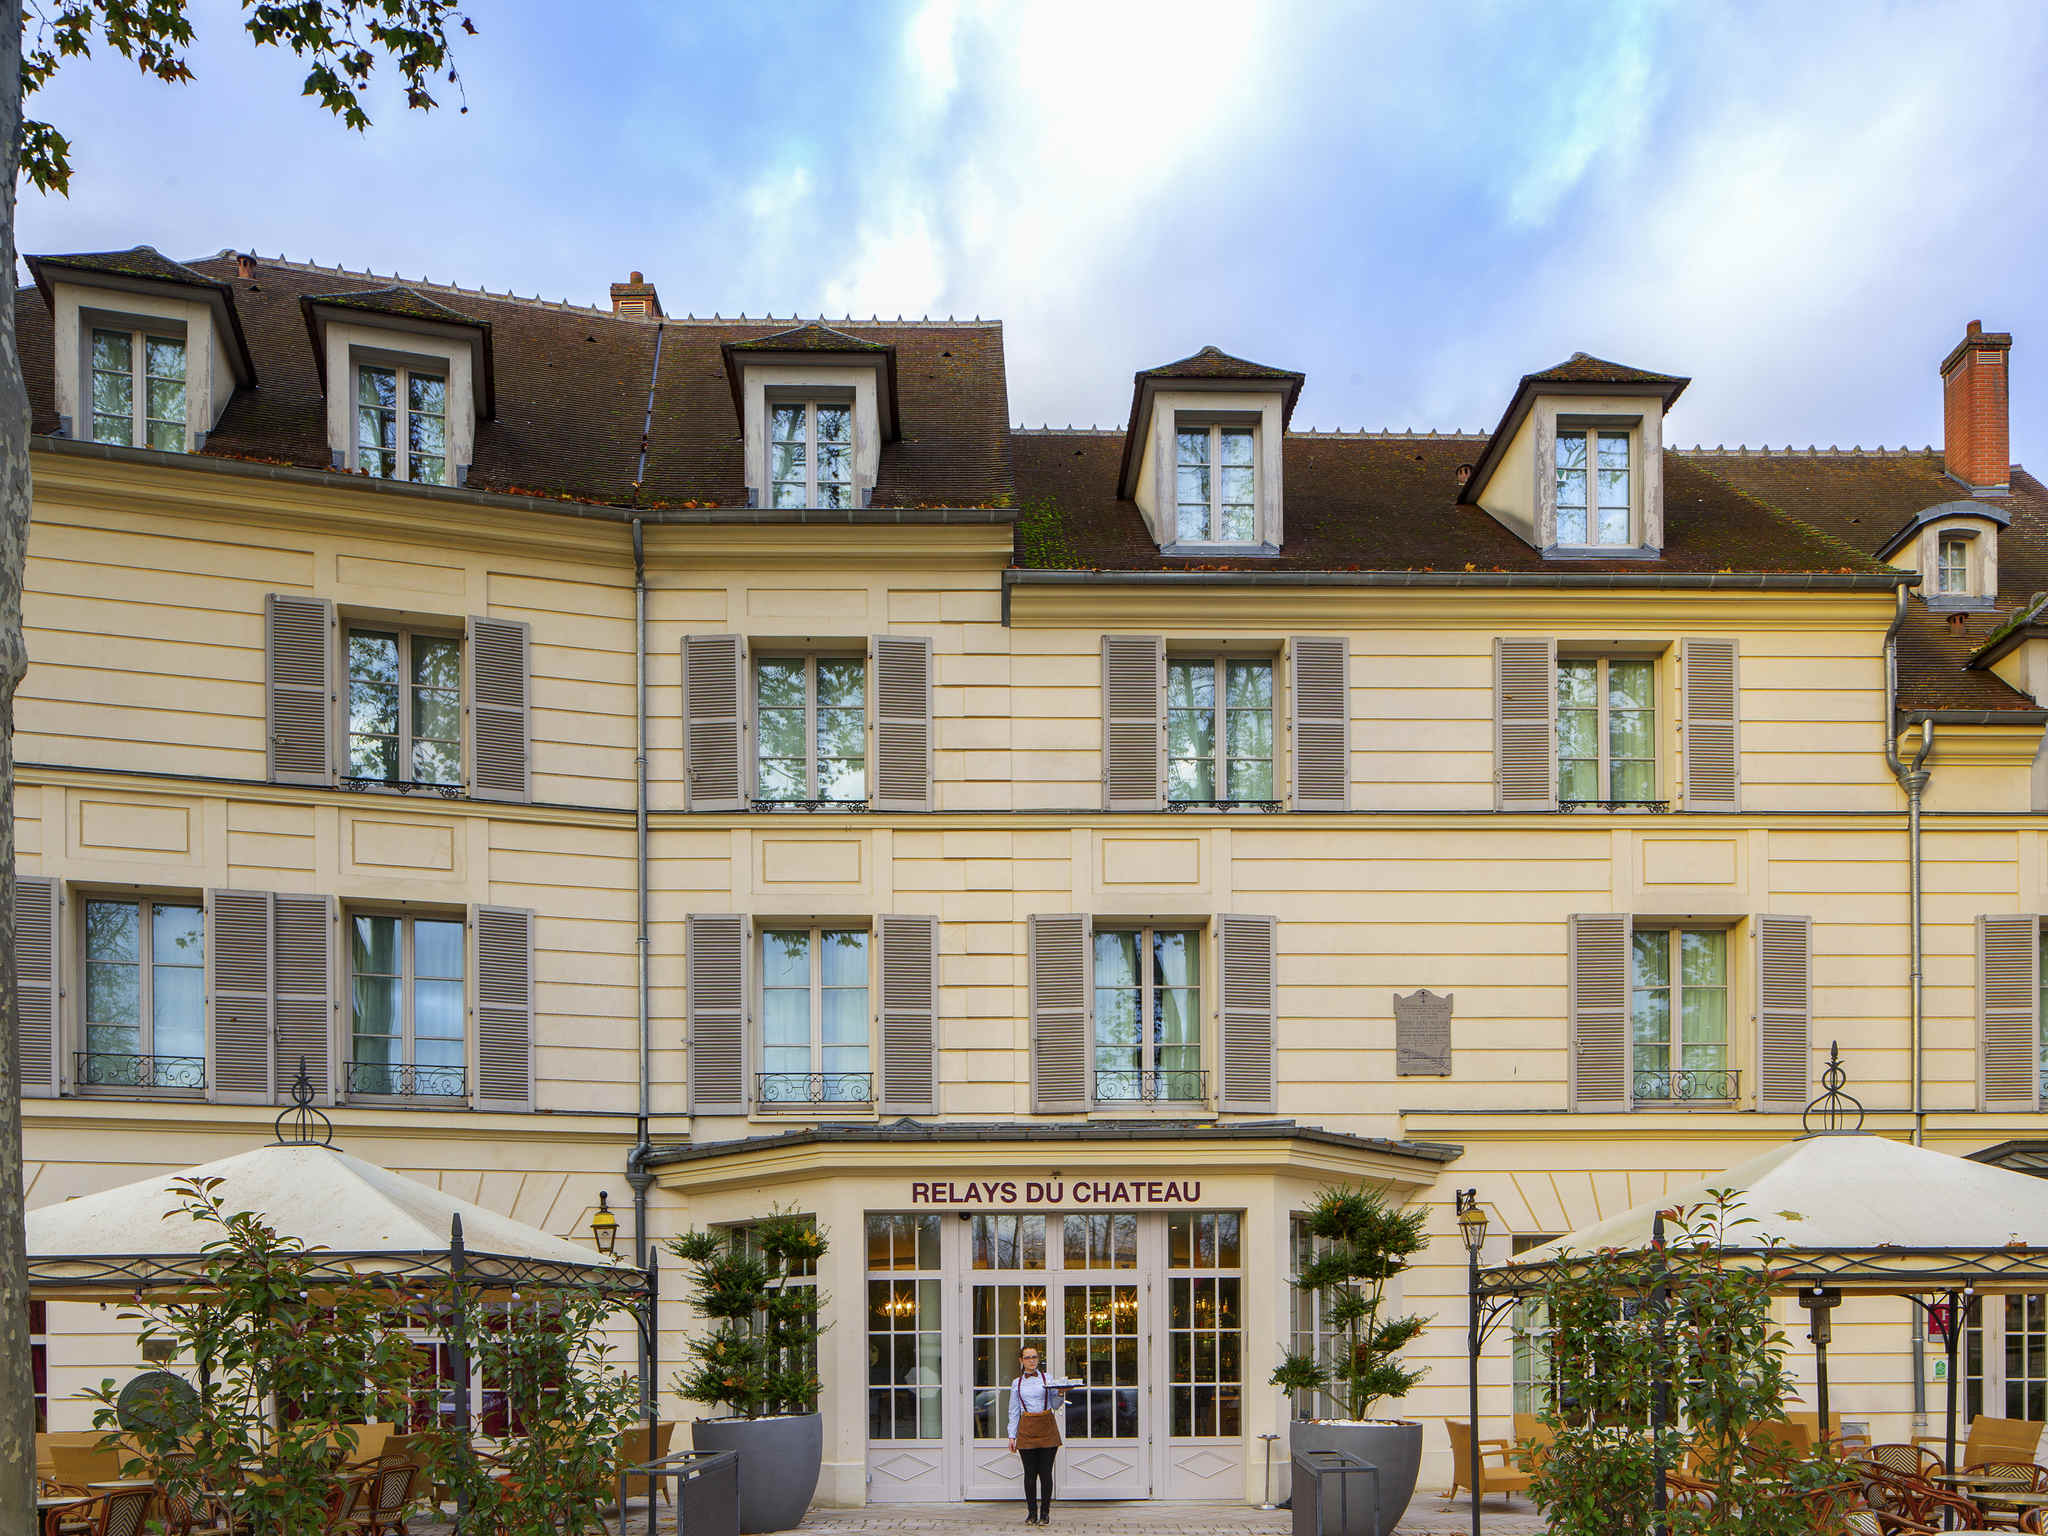 فندق - Hôtel Mercure Rambouillet Relays du Château